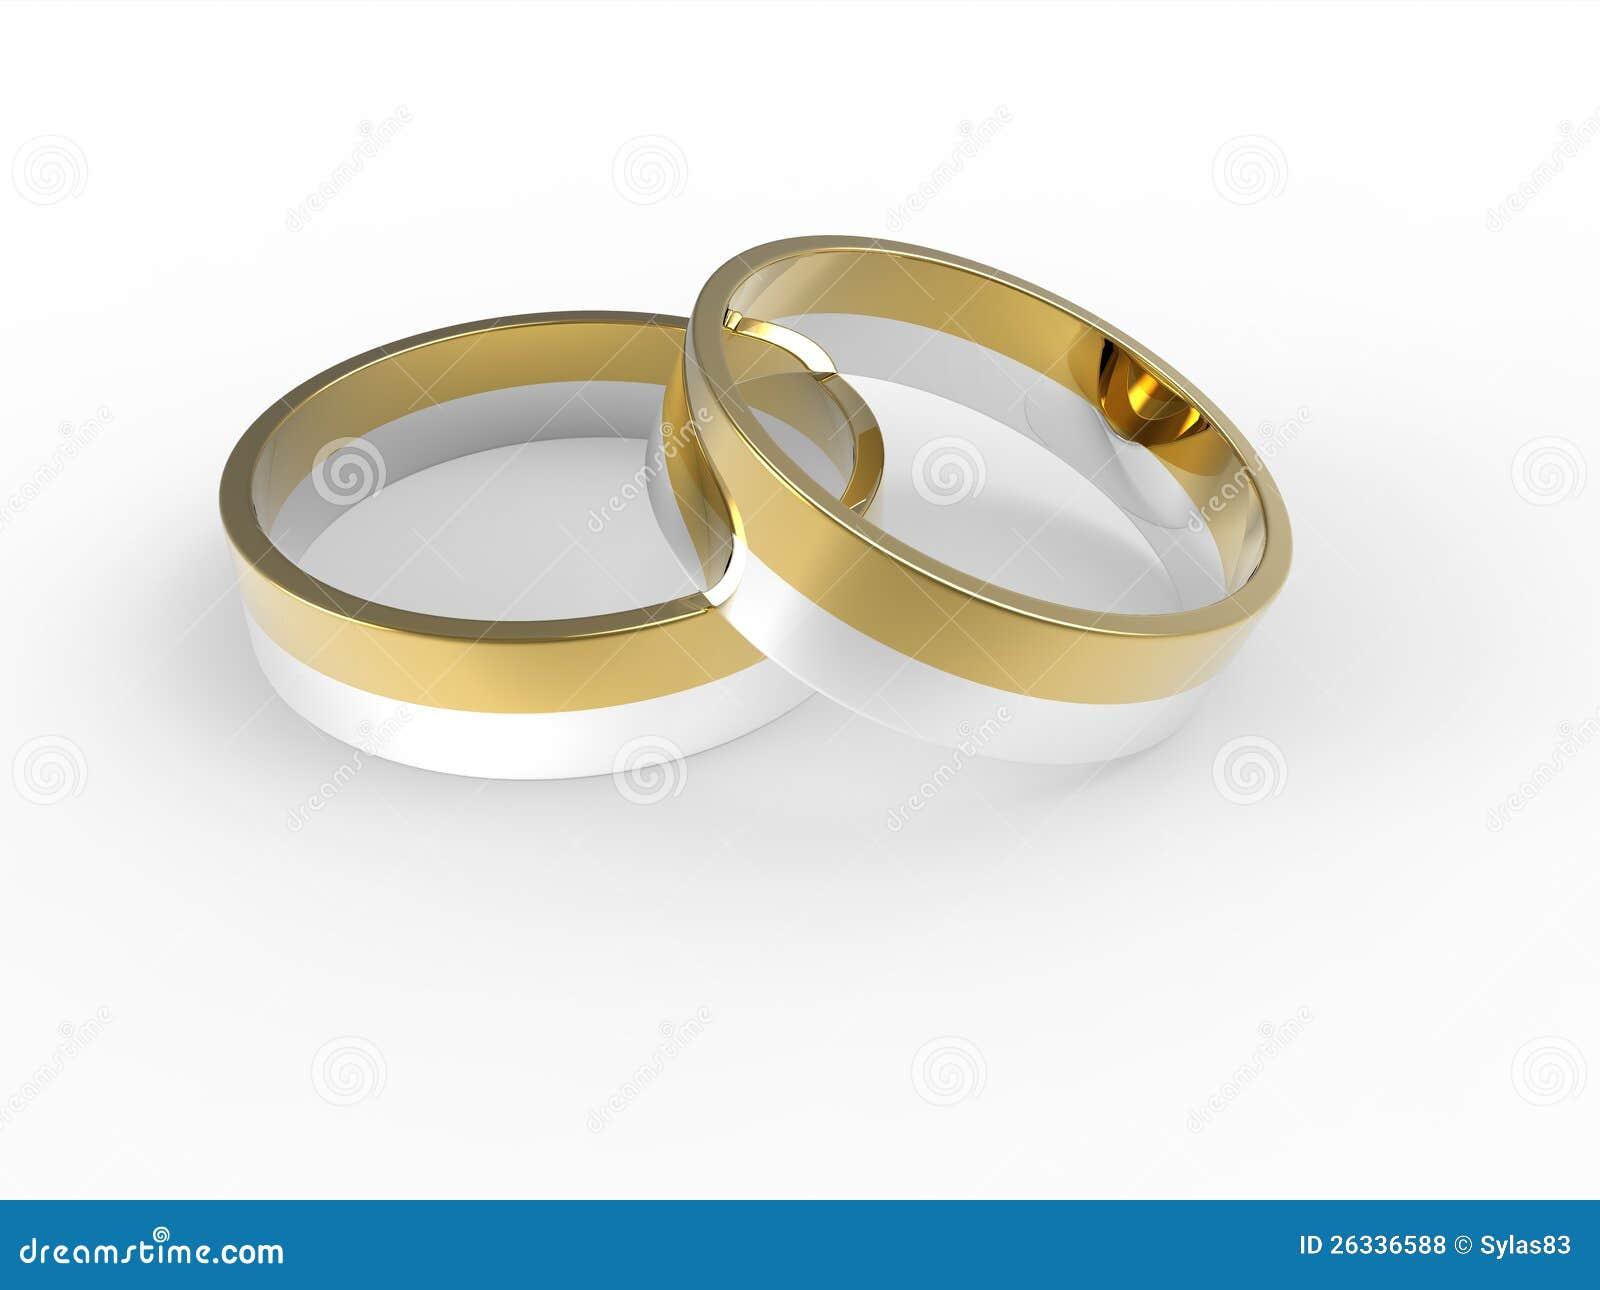 Golden And Silver Wedding Rings Stock Illustration Illustration of